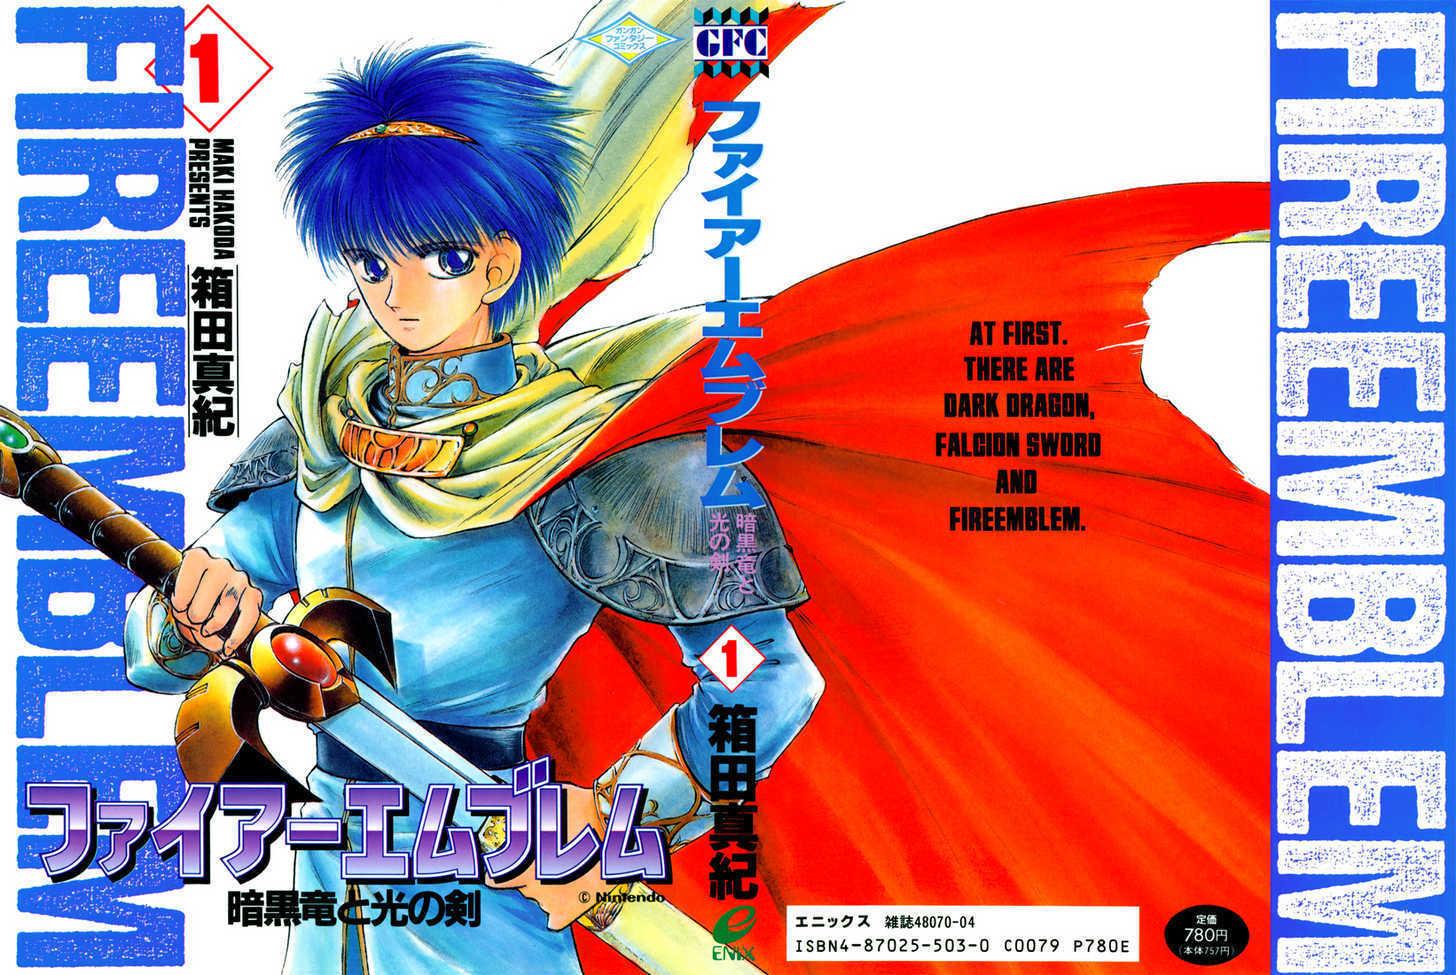 Fire Emblem: Ankokuryuu to Hikari no Ken 1.1 Page 1